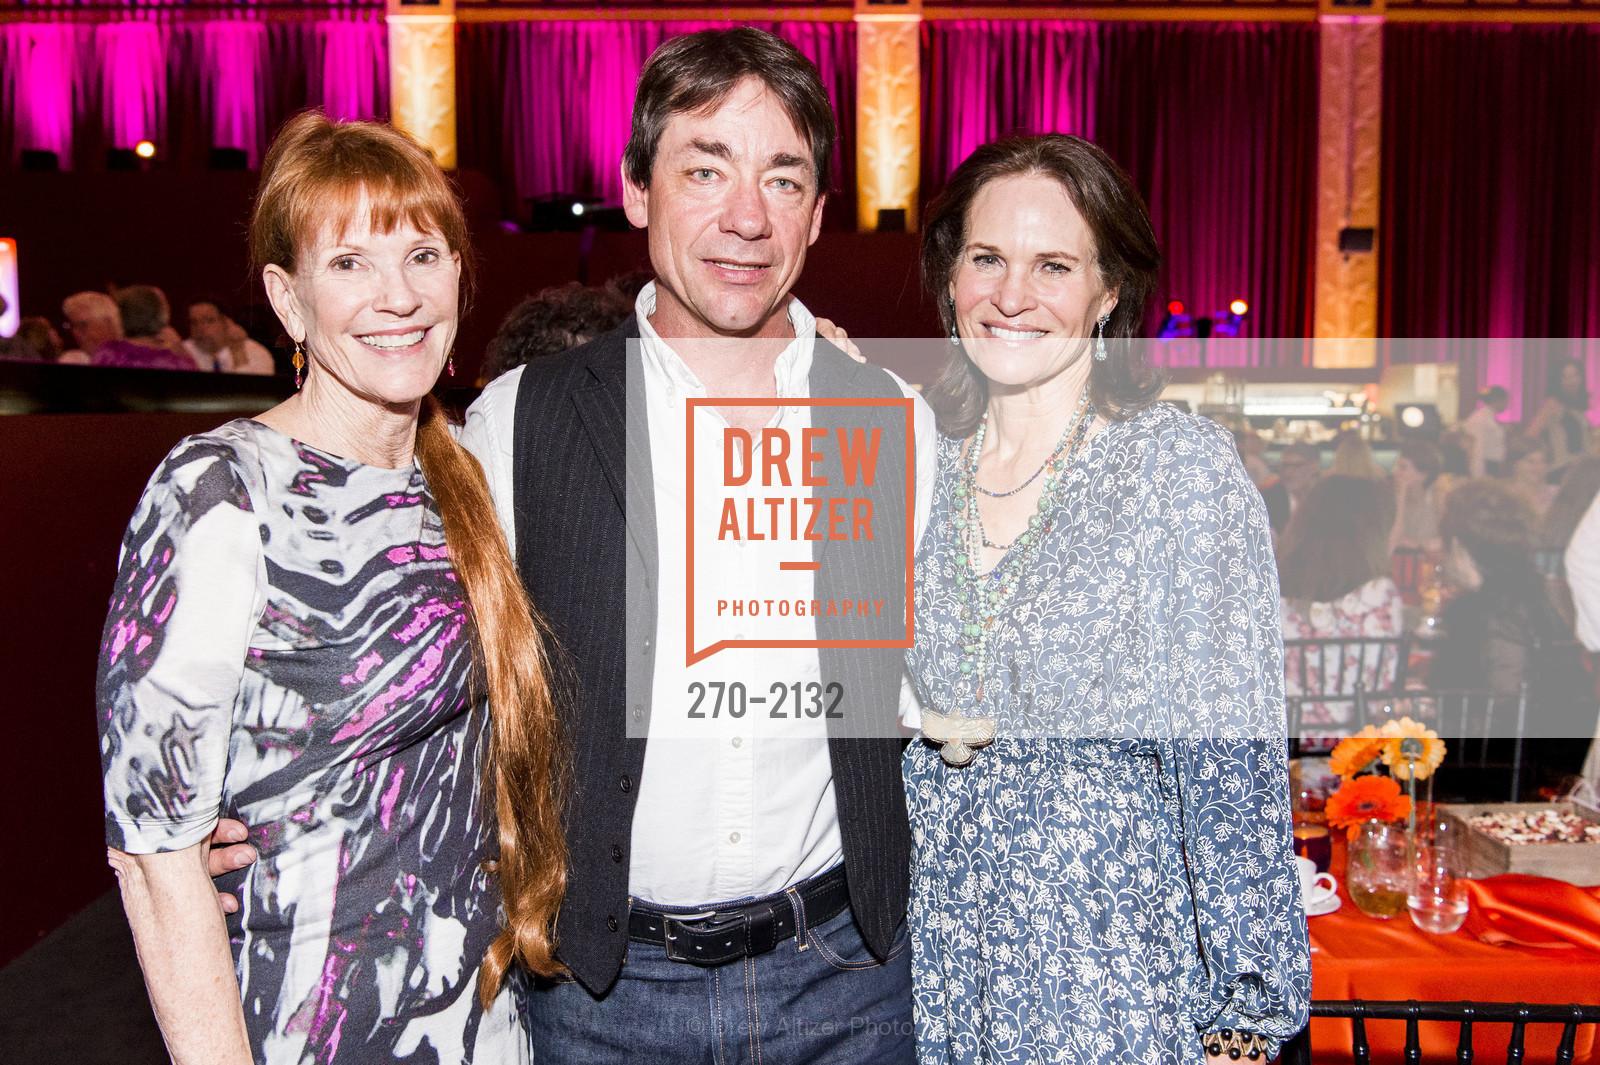 Helen Spalding, Paul Wattis, Randi Fisher, Photo #270-2132